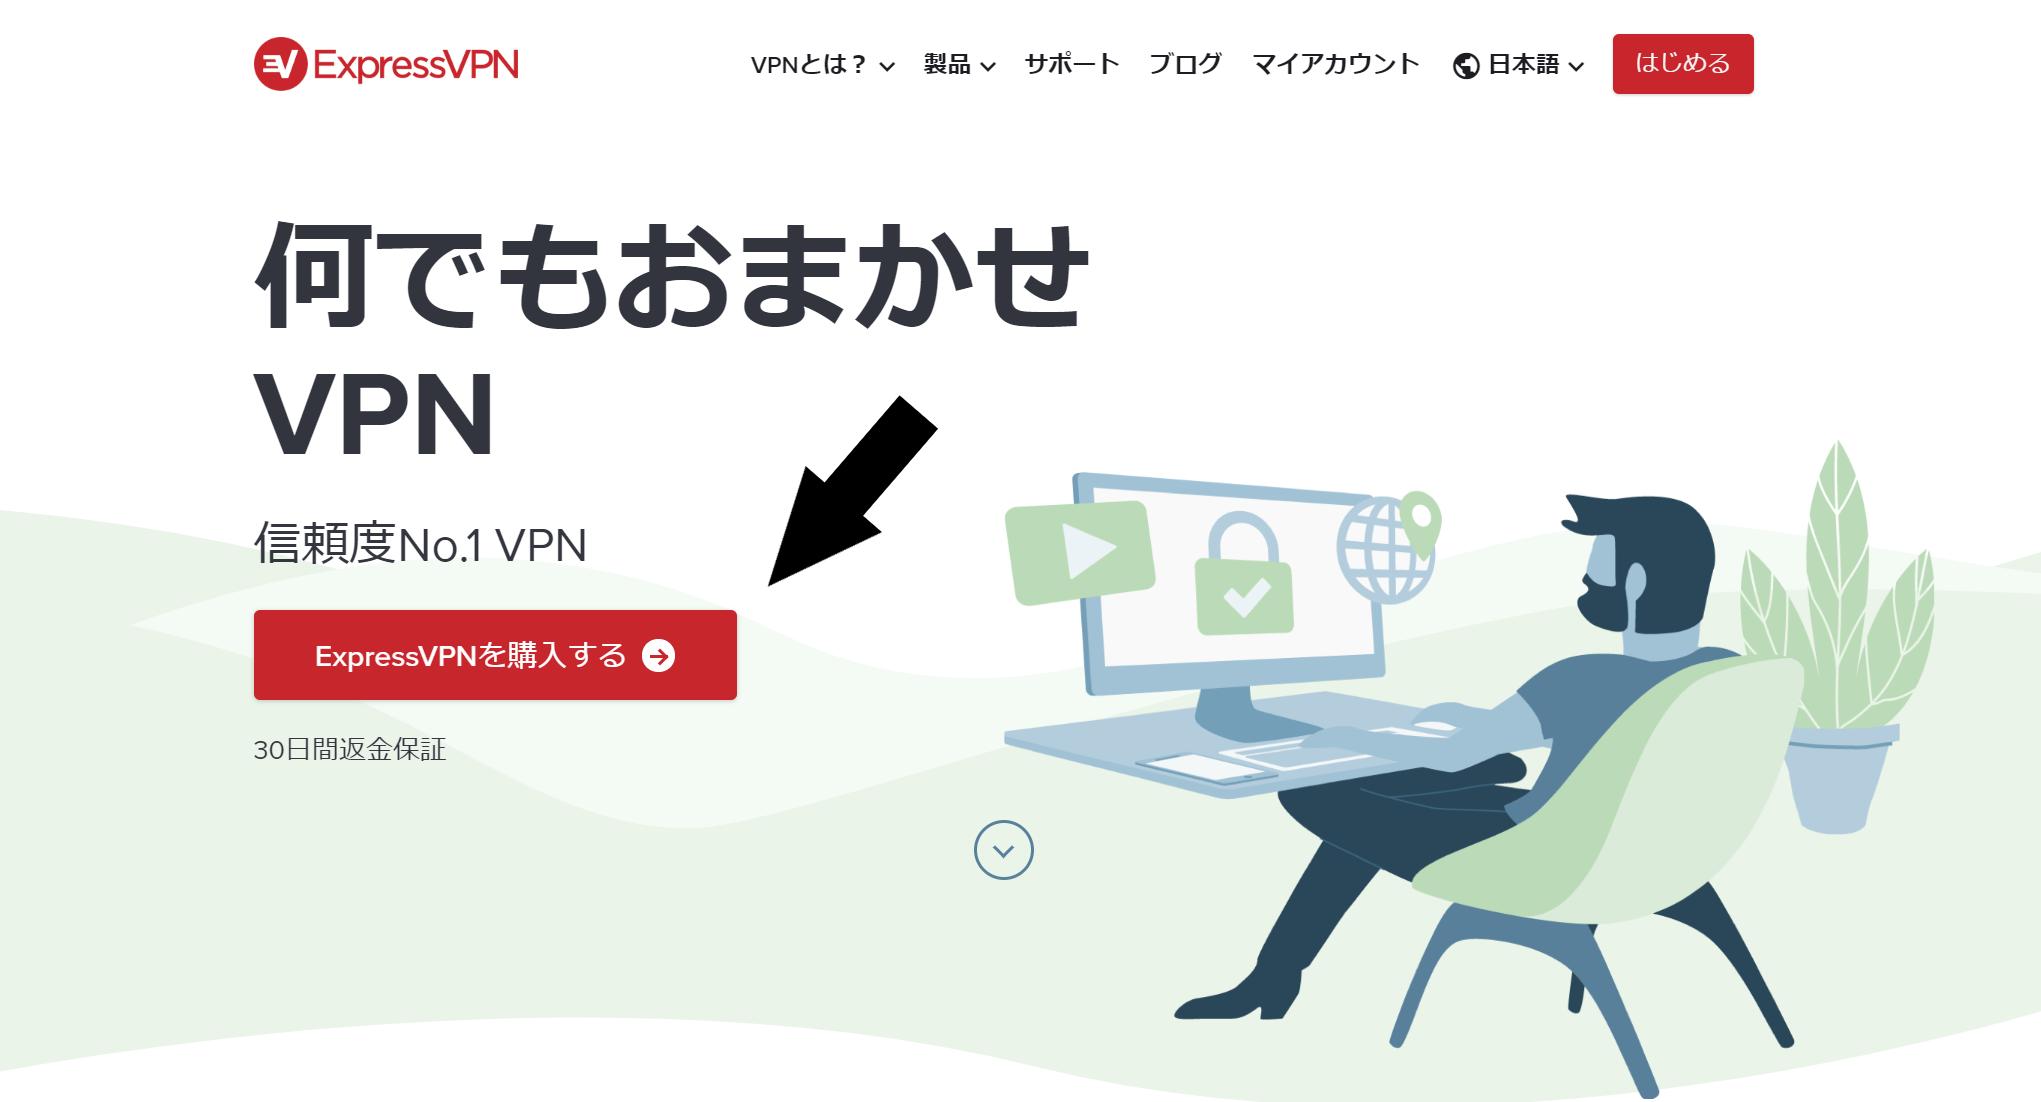 expressVPNの購入画面